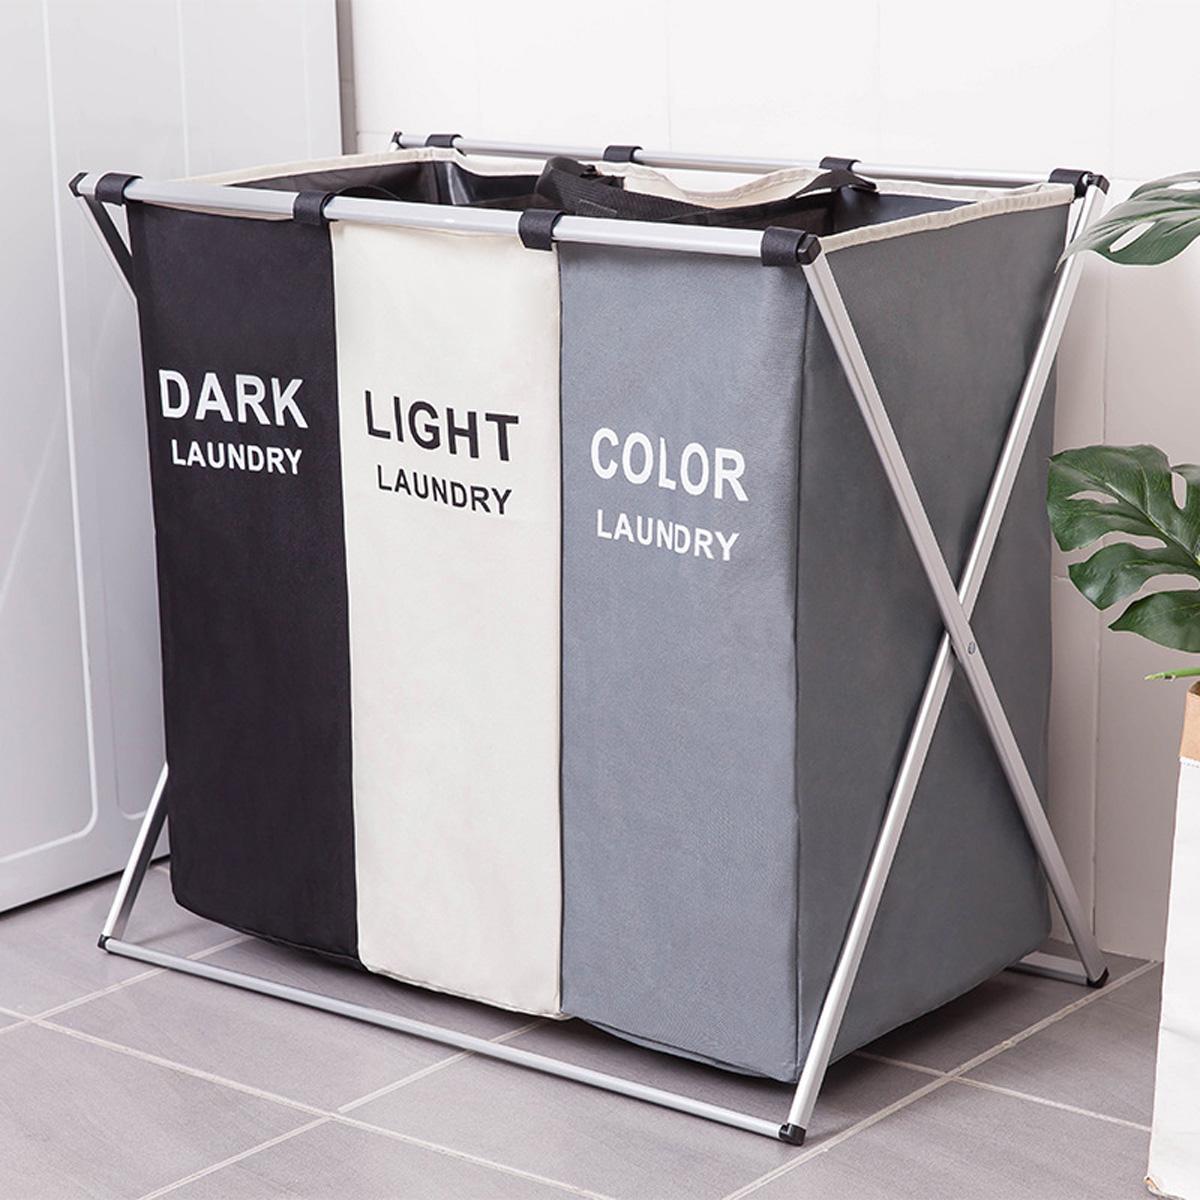 Offer Ưu Đãi Laundry Hamper Foldable Laundry Basket 1/2/3 Section Portable Dirty Cloth Sorter